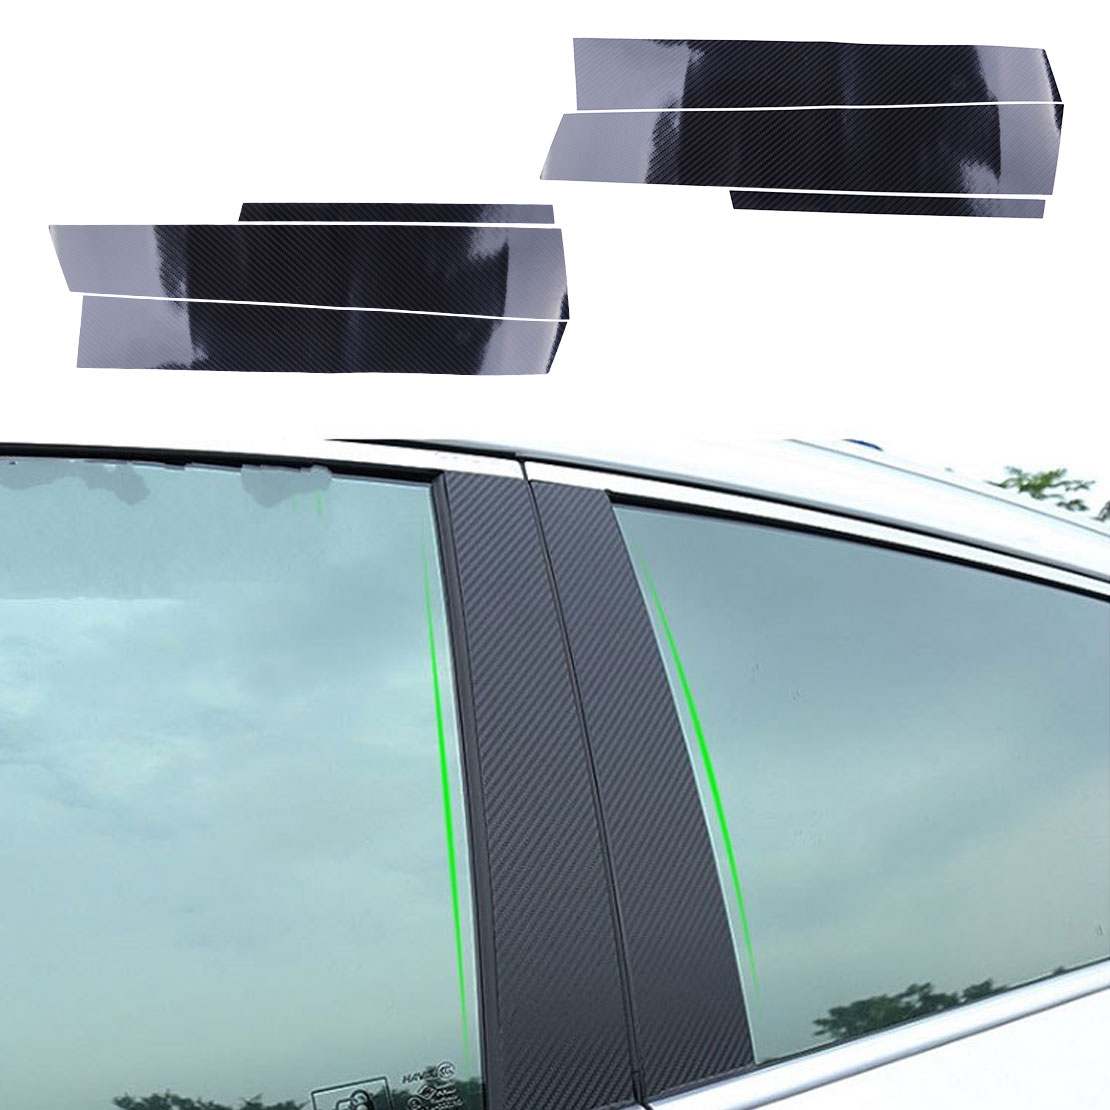 DWCX, 6 uds., pegatina de fibra de carbono negra para puerta de coche, ventana central, poste del pilar B, pegatina de cubierta embellecedora compatible con Honda Civic Sedan 2006-2010 2011